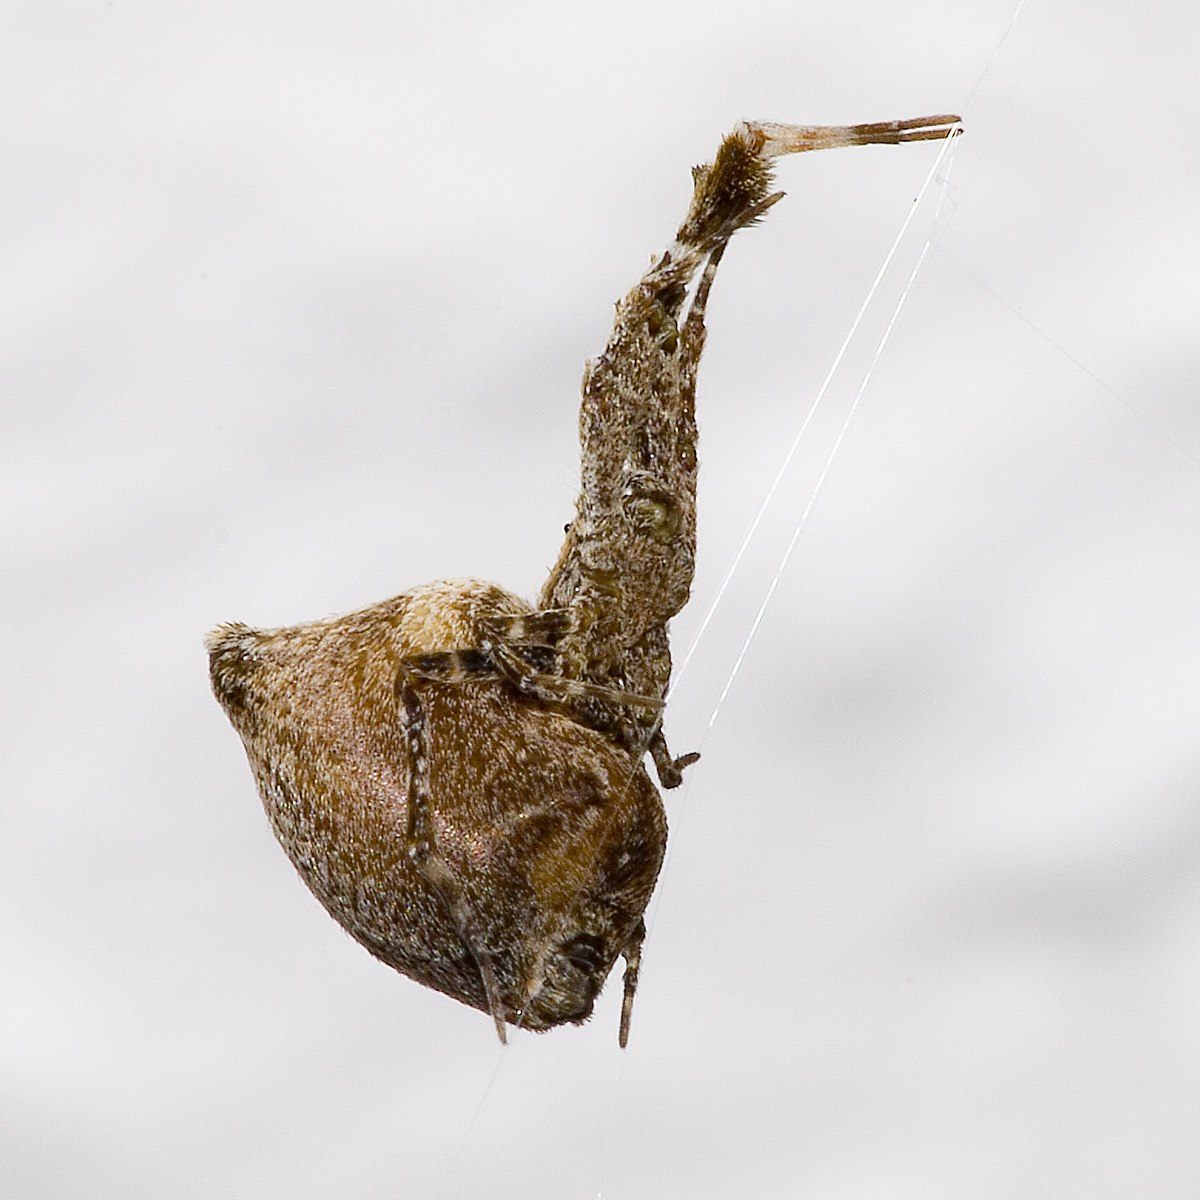 Uloboridae - Wikipedia